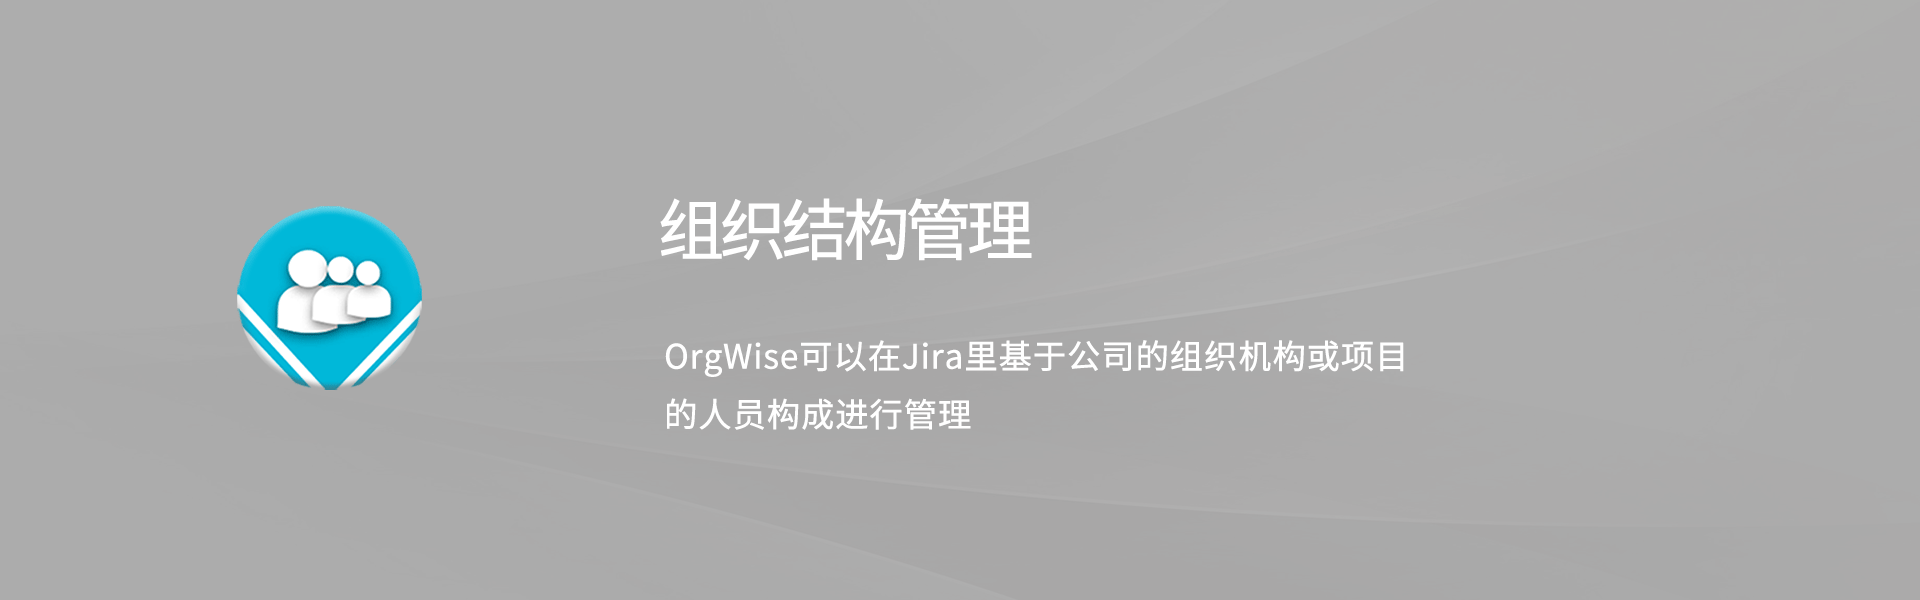 atlassian-orgwise-banner